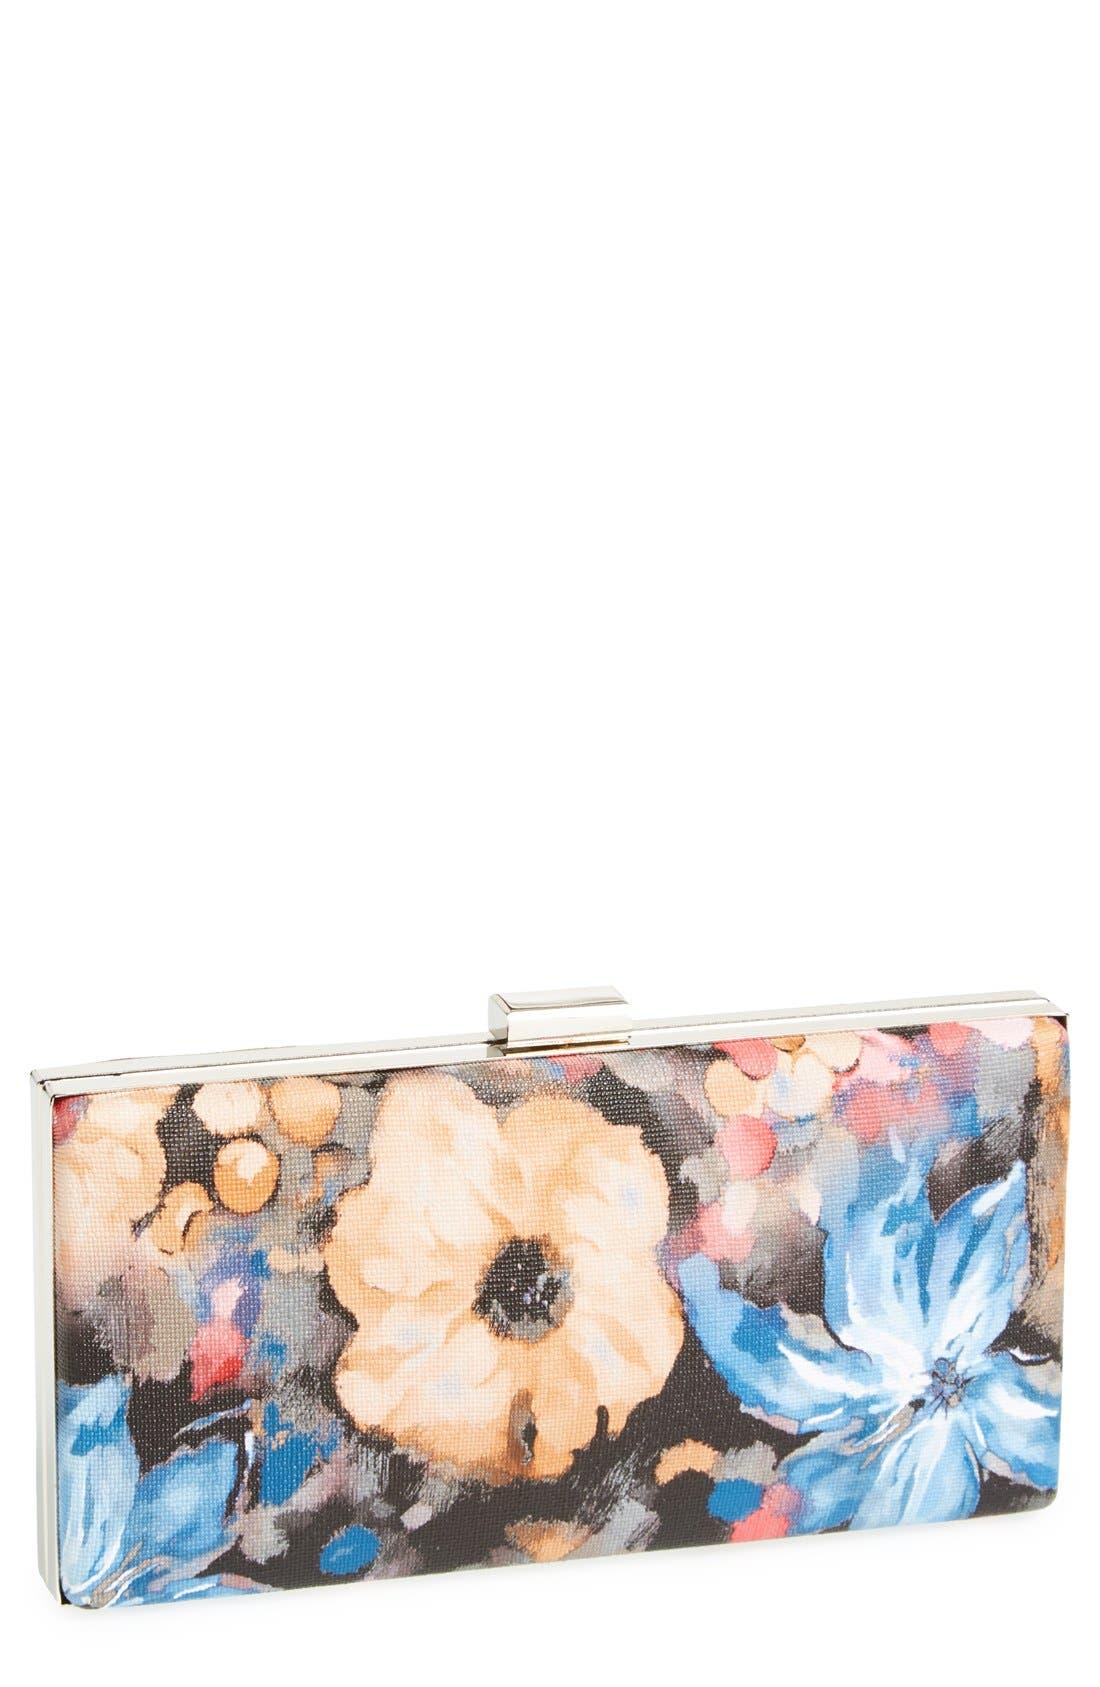 Alternate Image 1 Selected - Natasha Couture 'Watercolor' Box Clutch